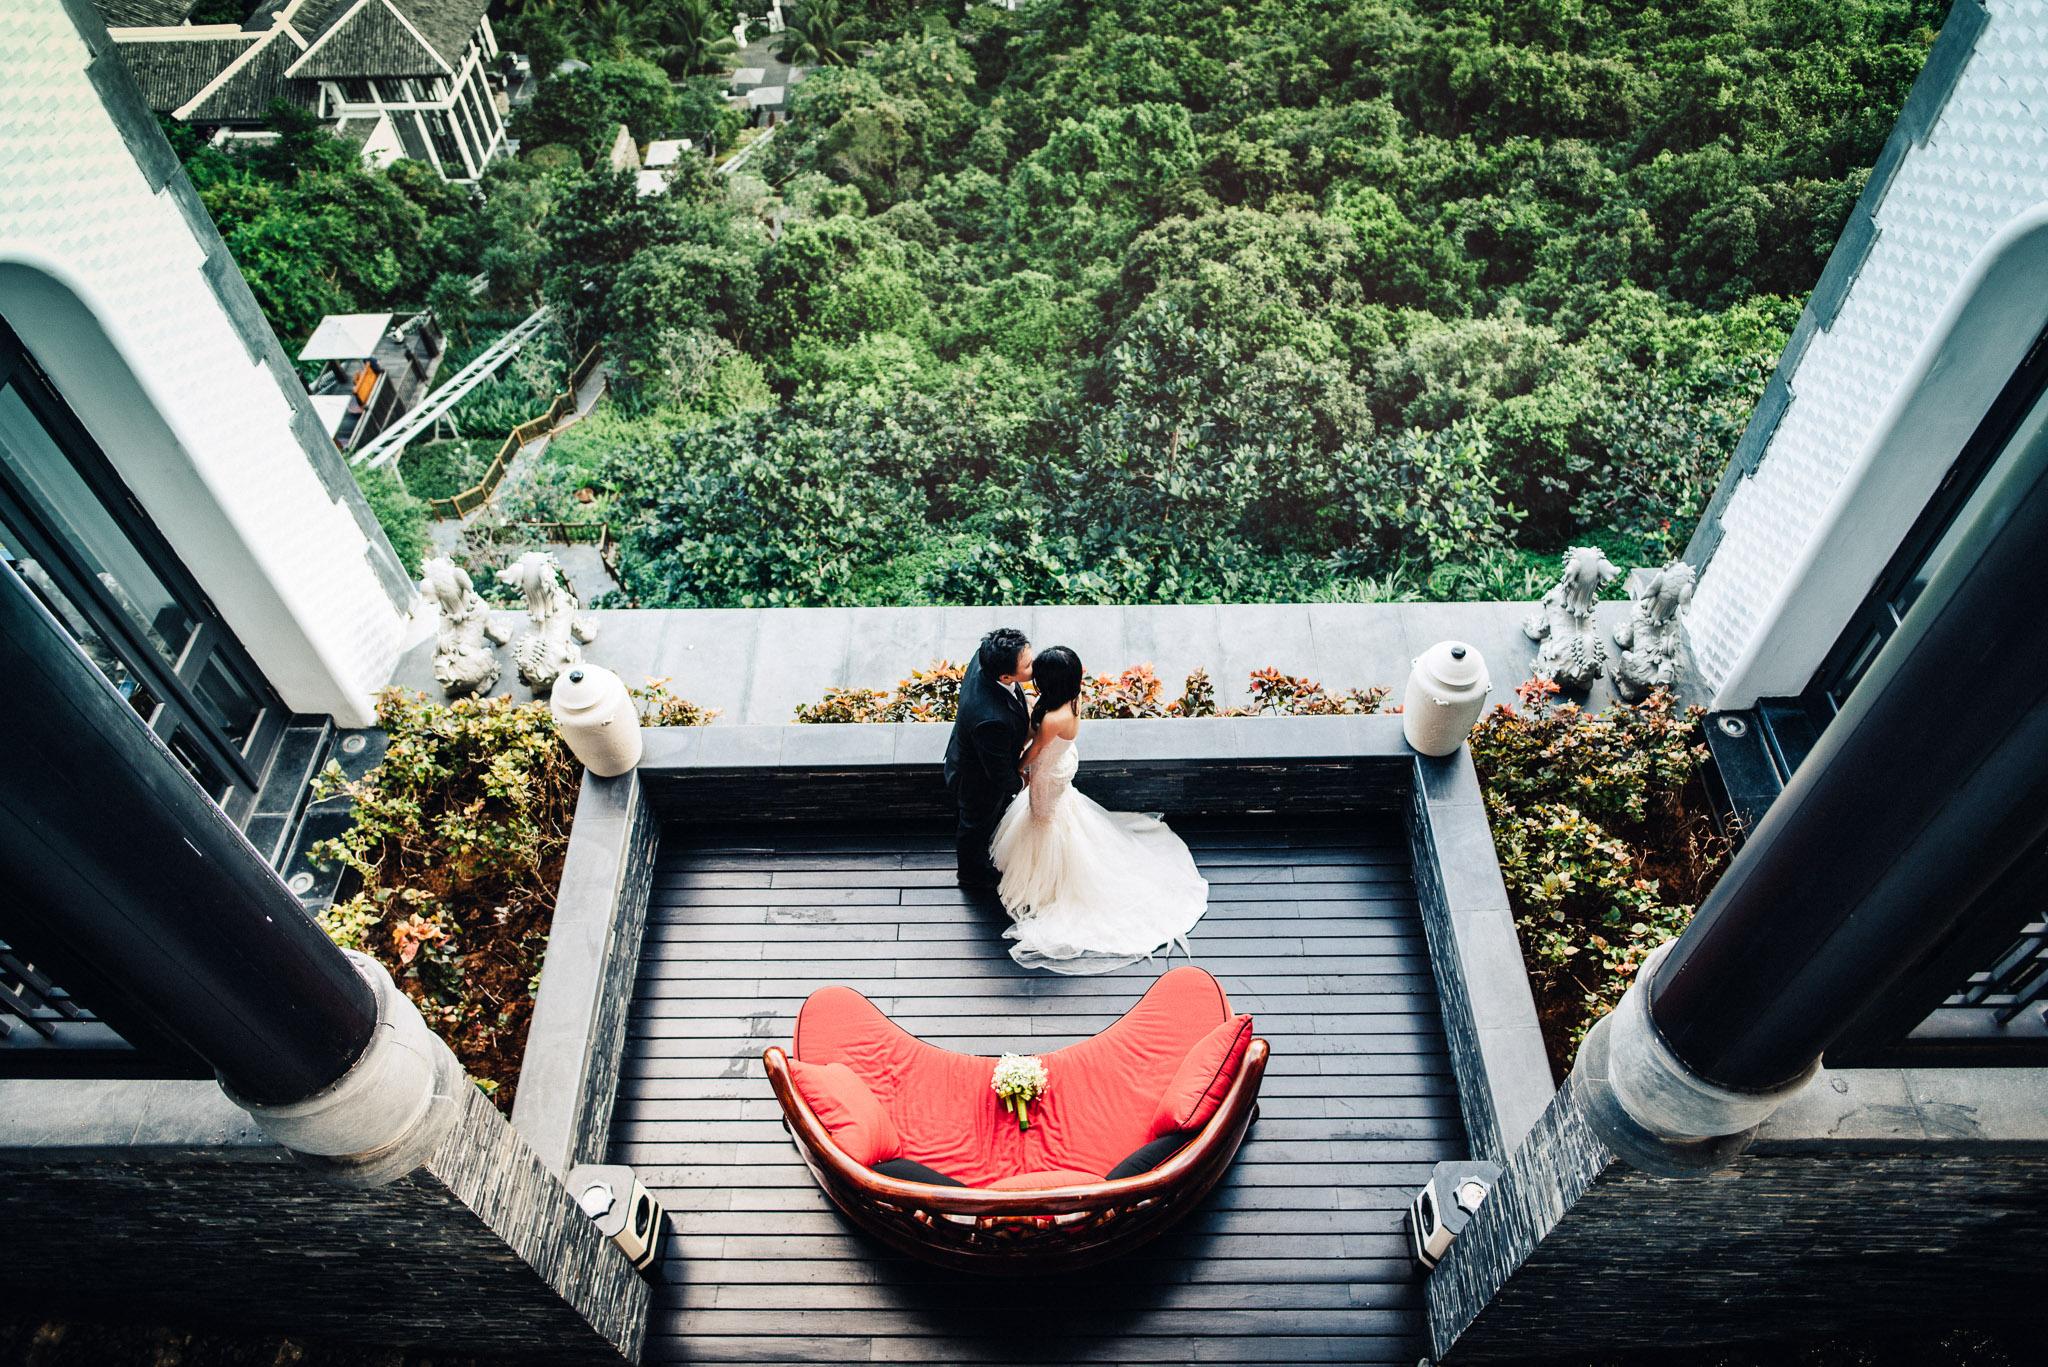 Phu - Trang prewedding (58 of 1392)-Edit.jpg